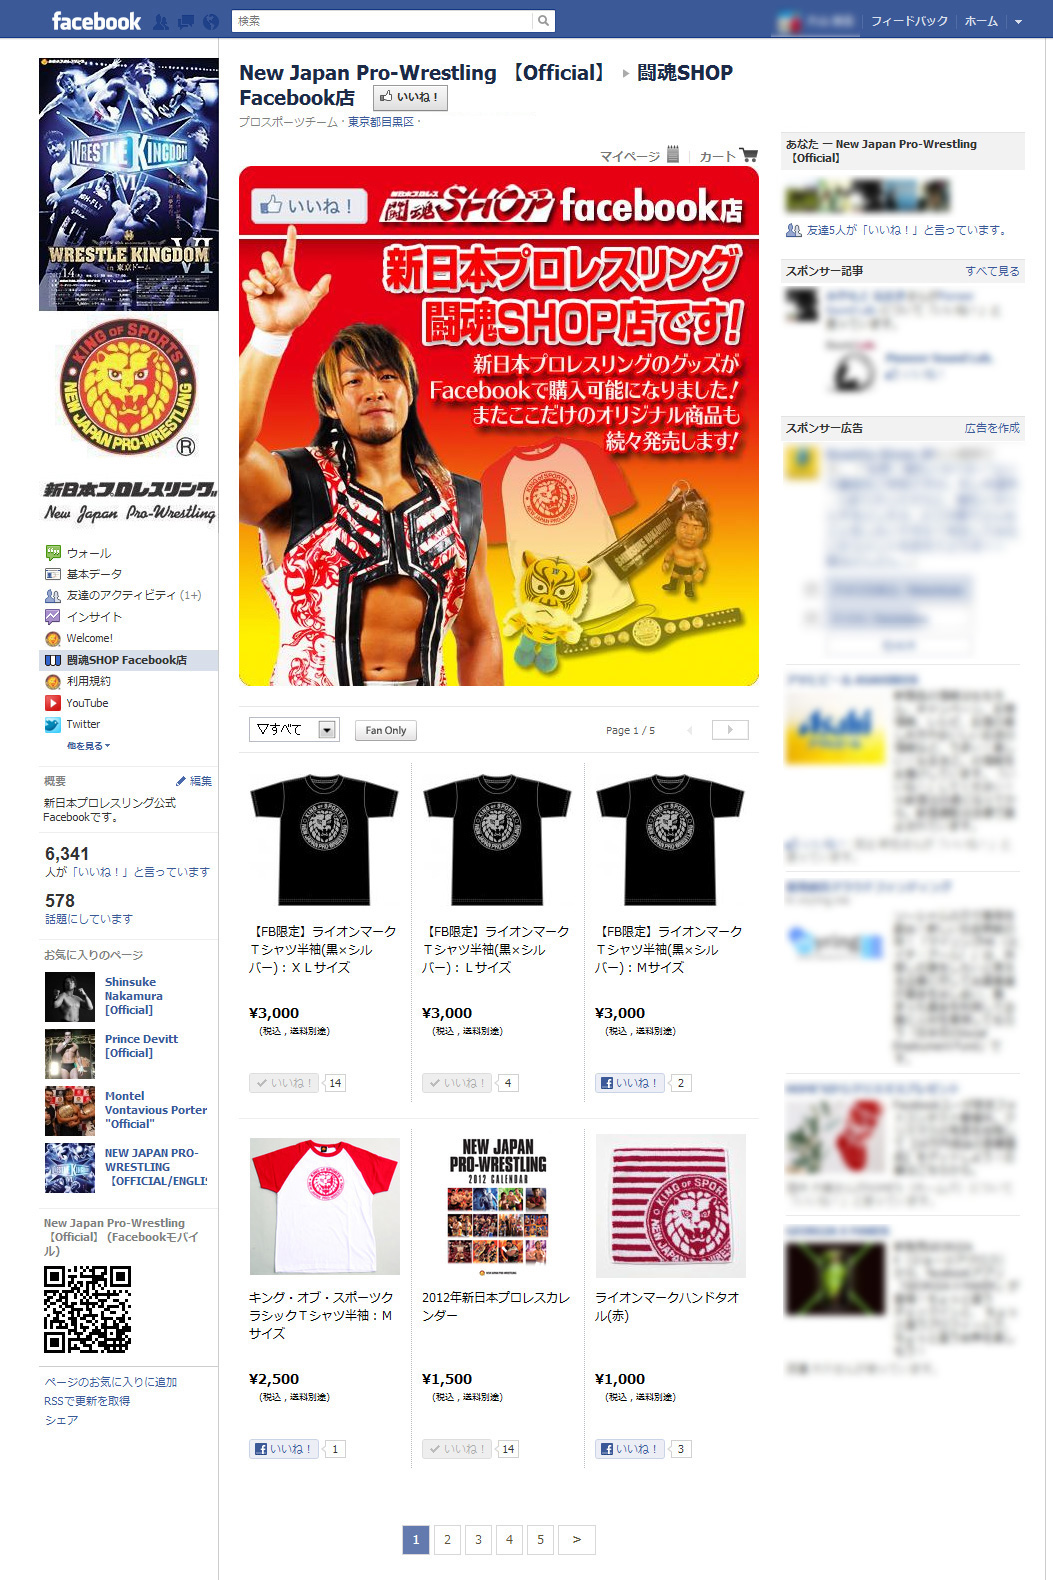 storelikeの商品一覧ページの例(闘魂SHOP Facebook店)